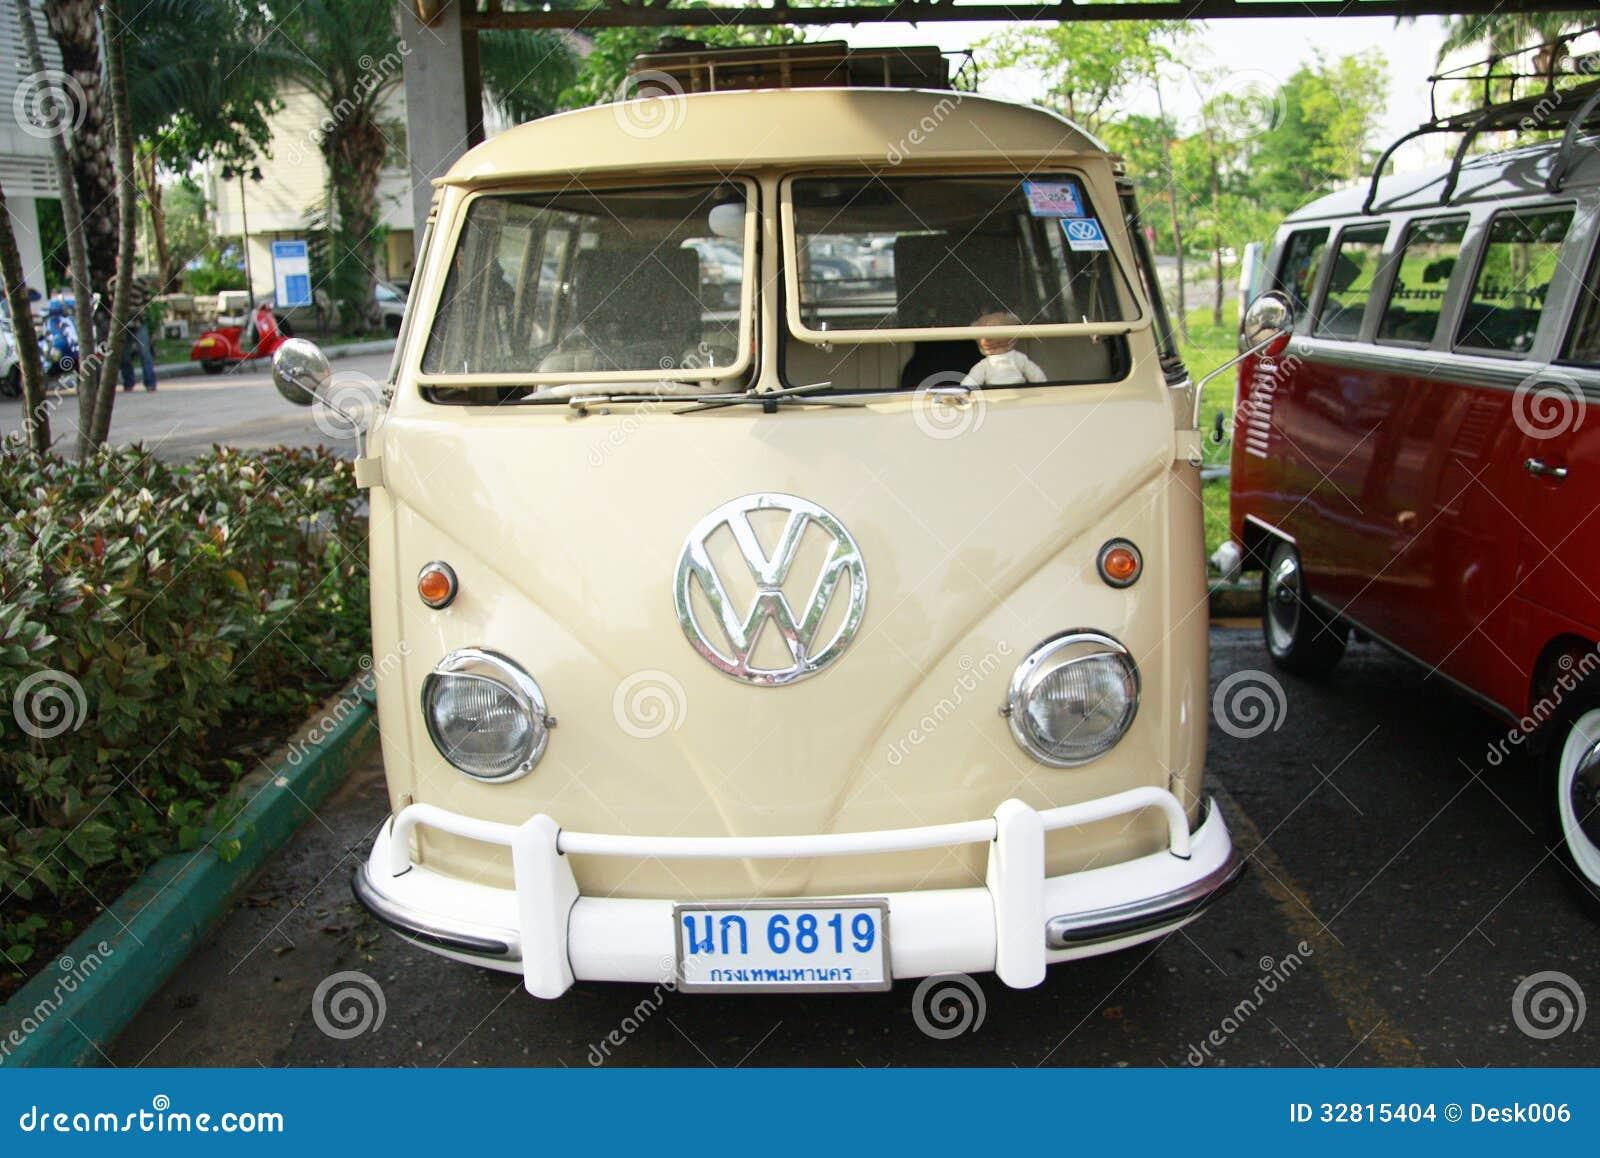 volkswagen retro vintage car split bus editorial stock image image of auto beautiful 32815404. Black Bedroom Furniture Sets. Home Design Ideas